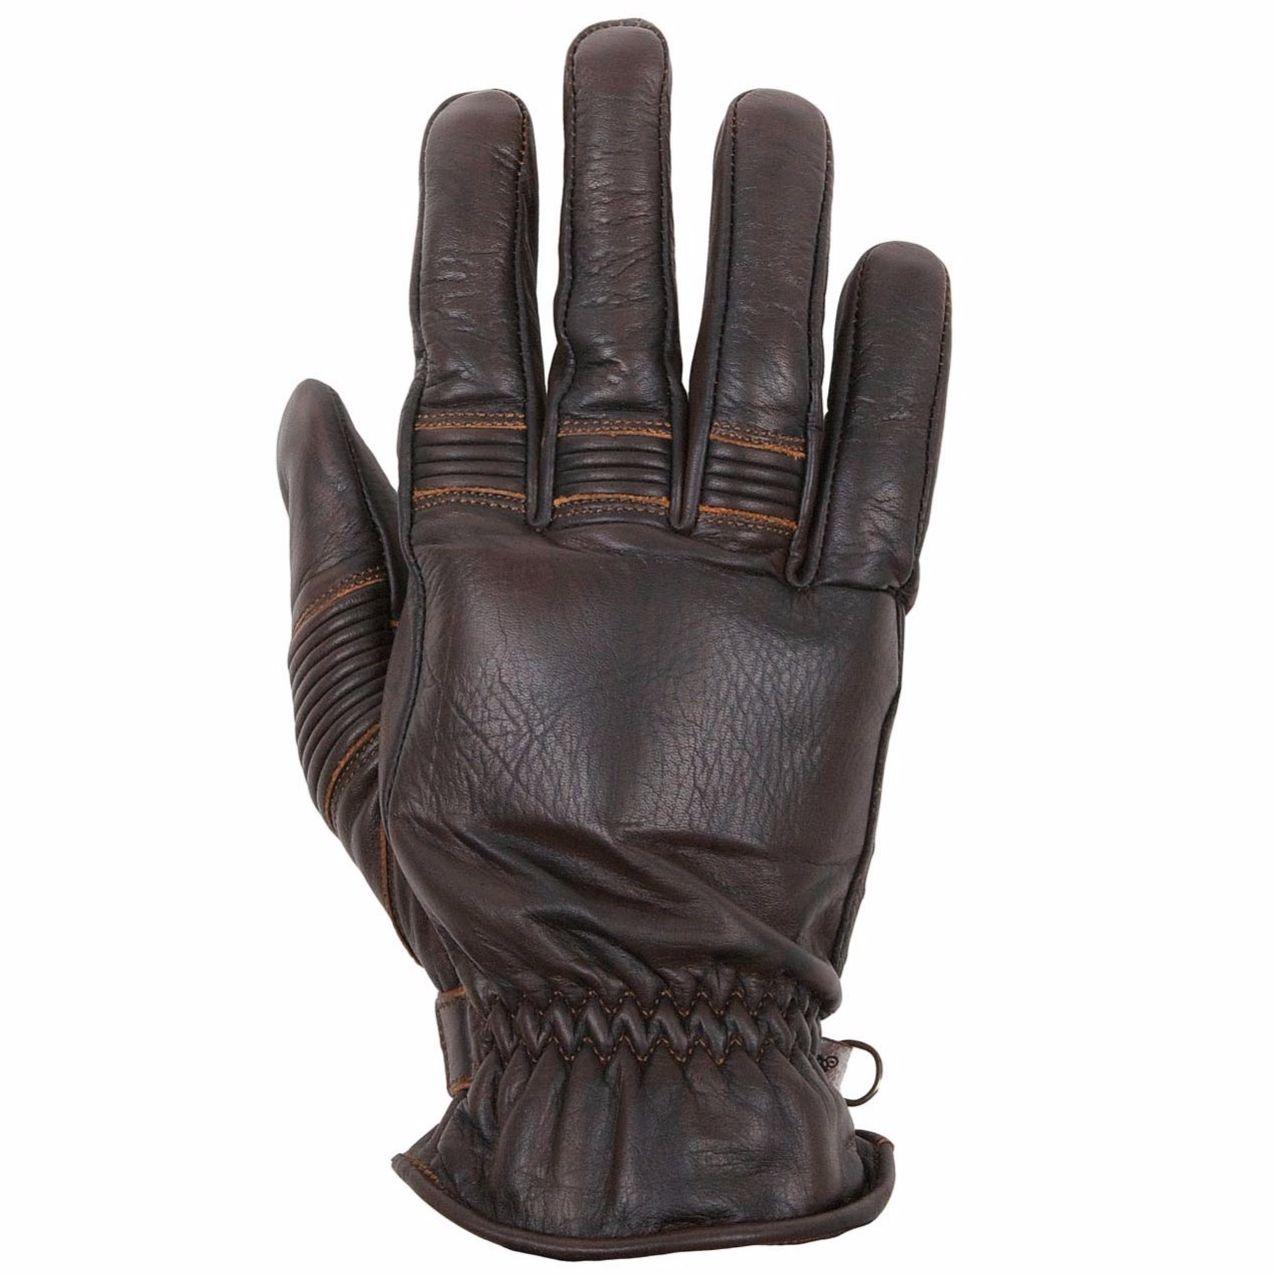 gants helstons velvet cuir pull up gants moto. Black Bedroom Furniture Sets. Home Design Ideas